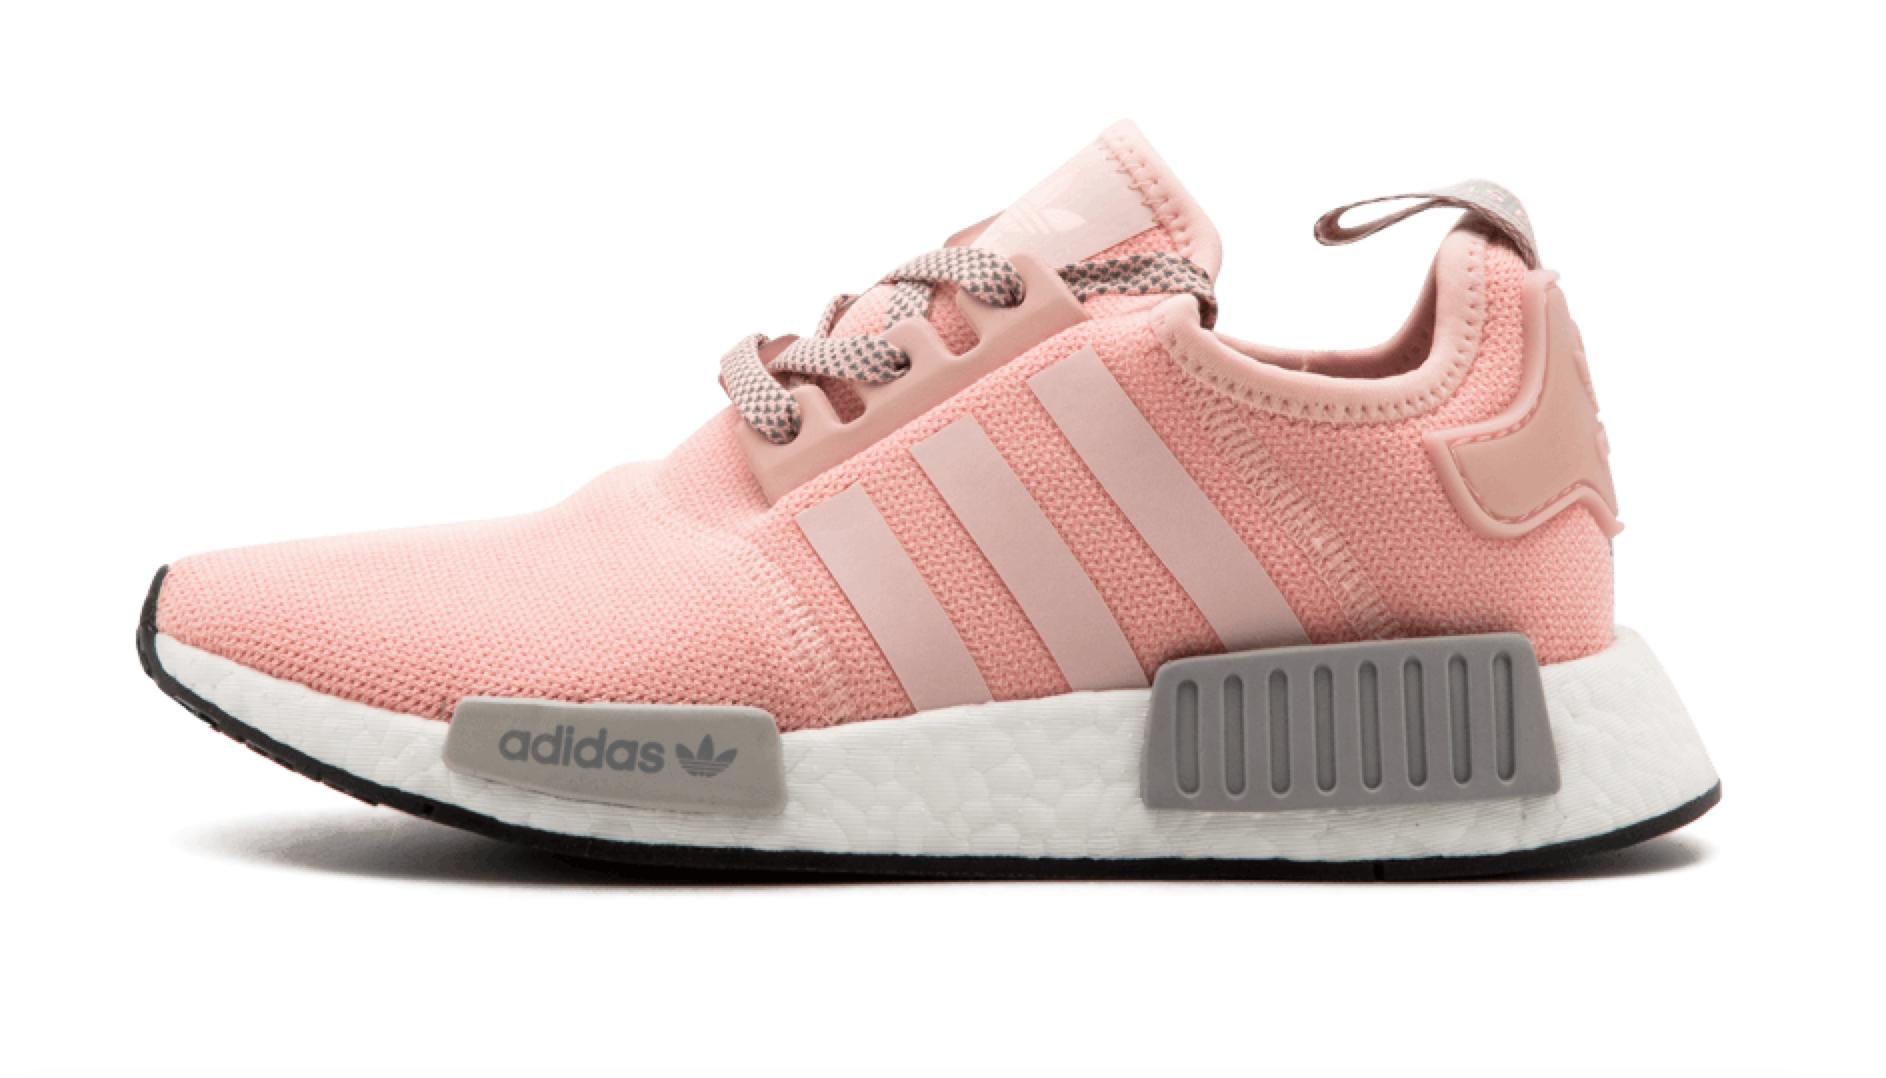 ecd3d9cb6 Adidas NMD R1 Pink Grey